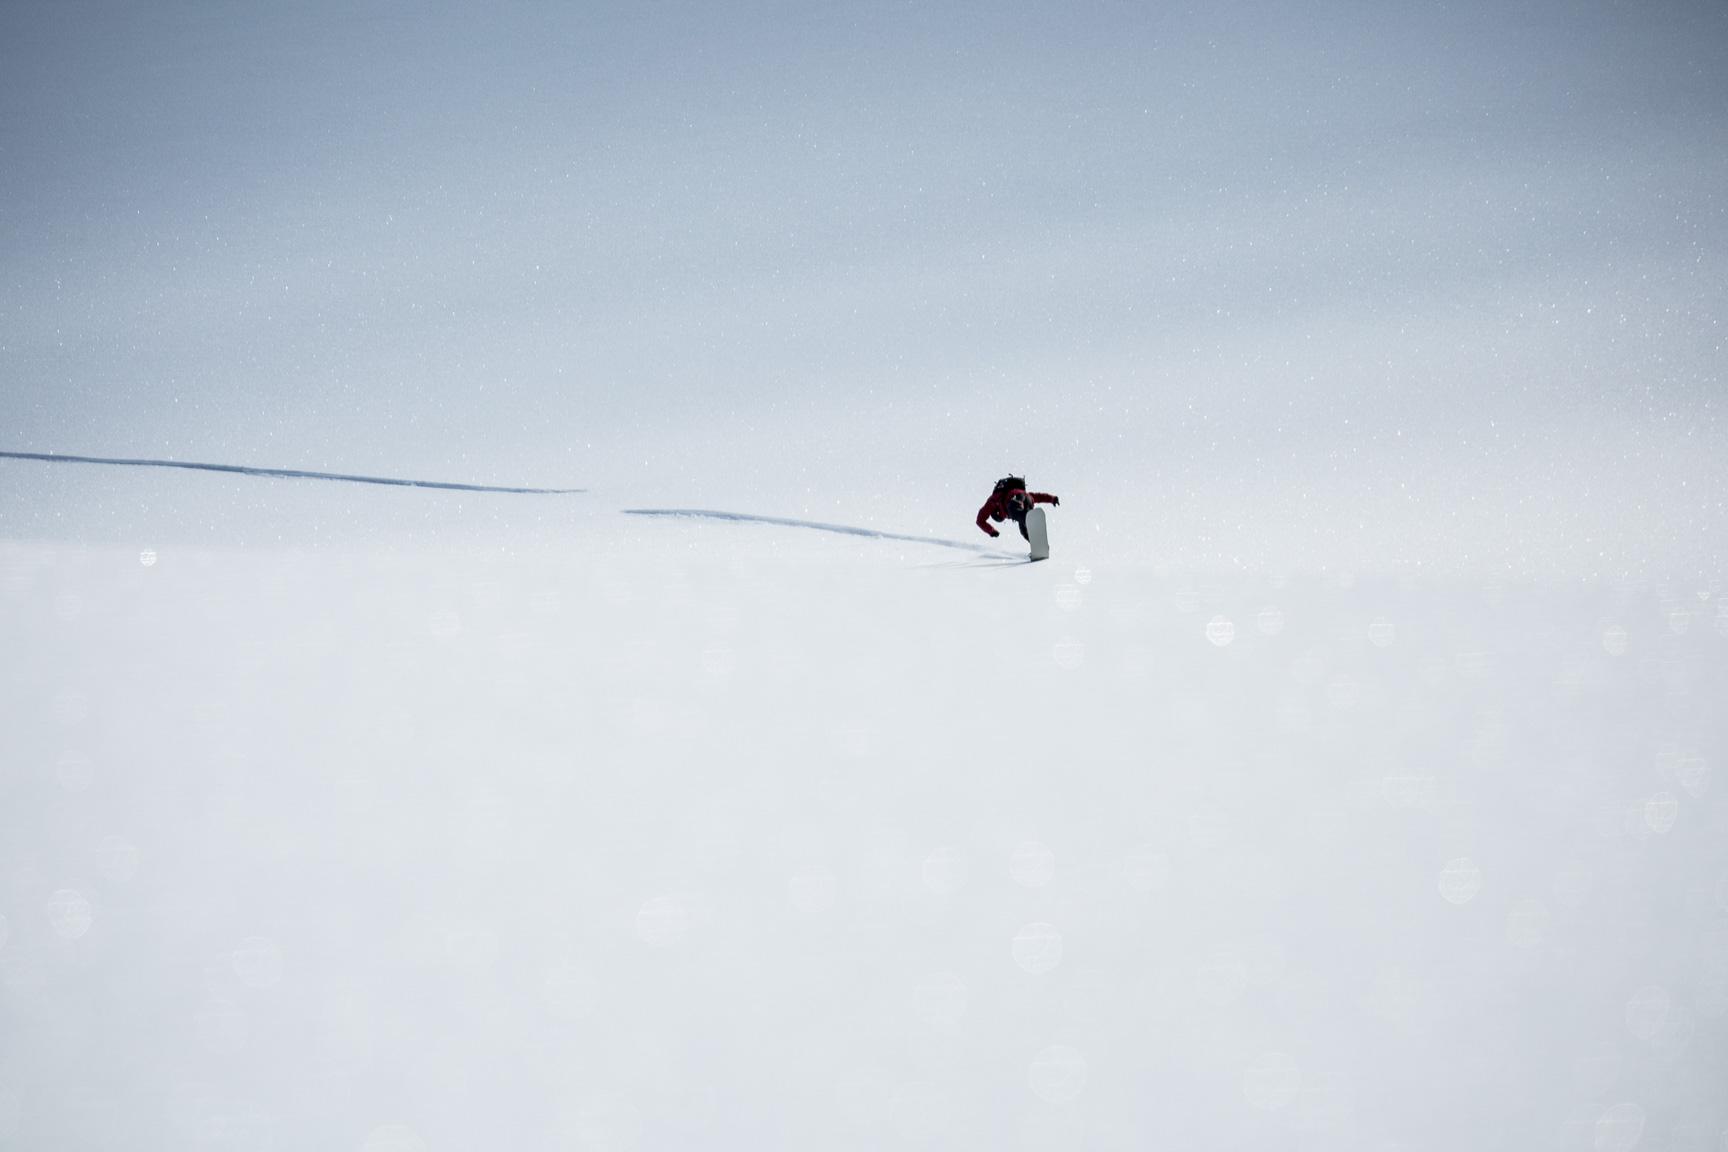 Bryan Iguchi, Valdez, Alaska